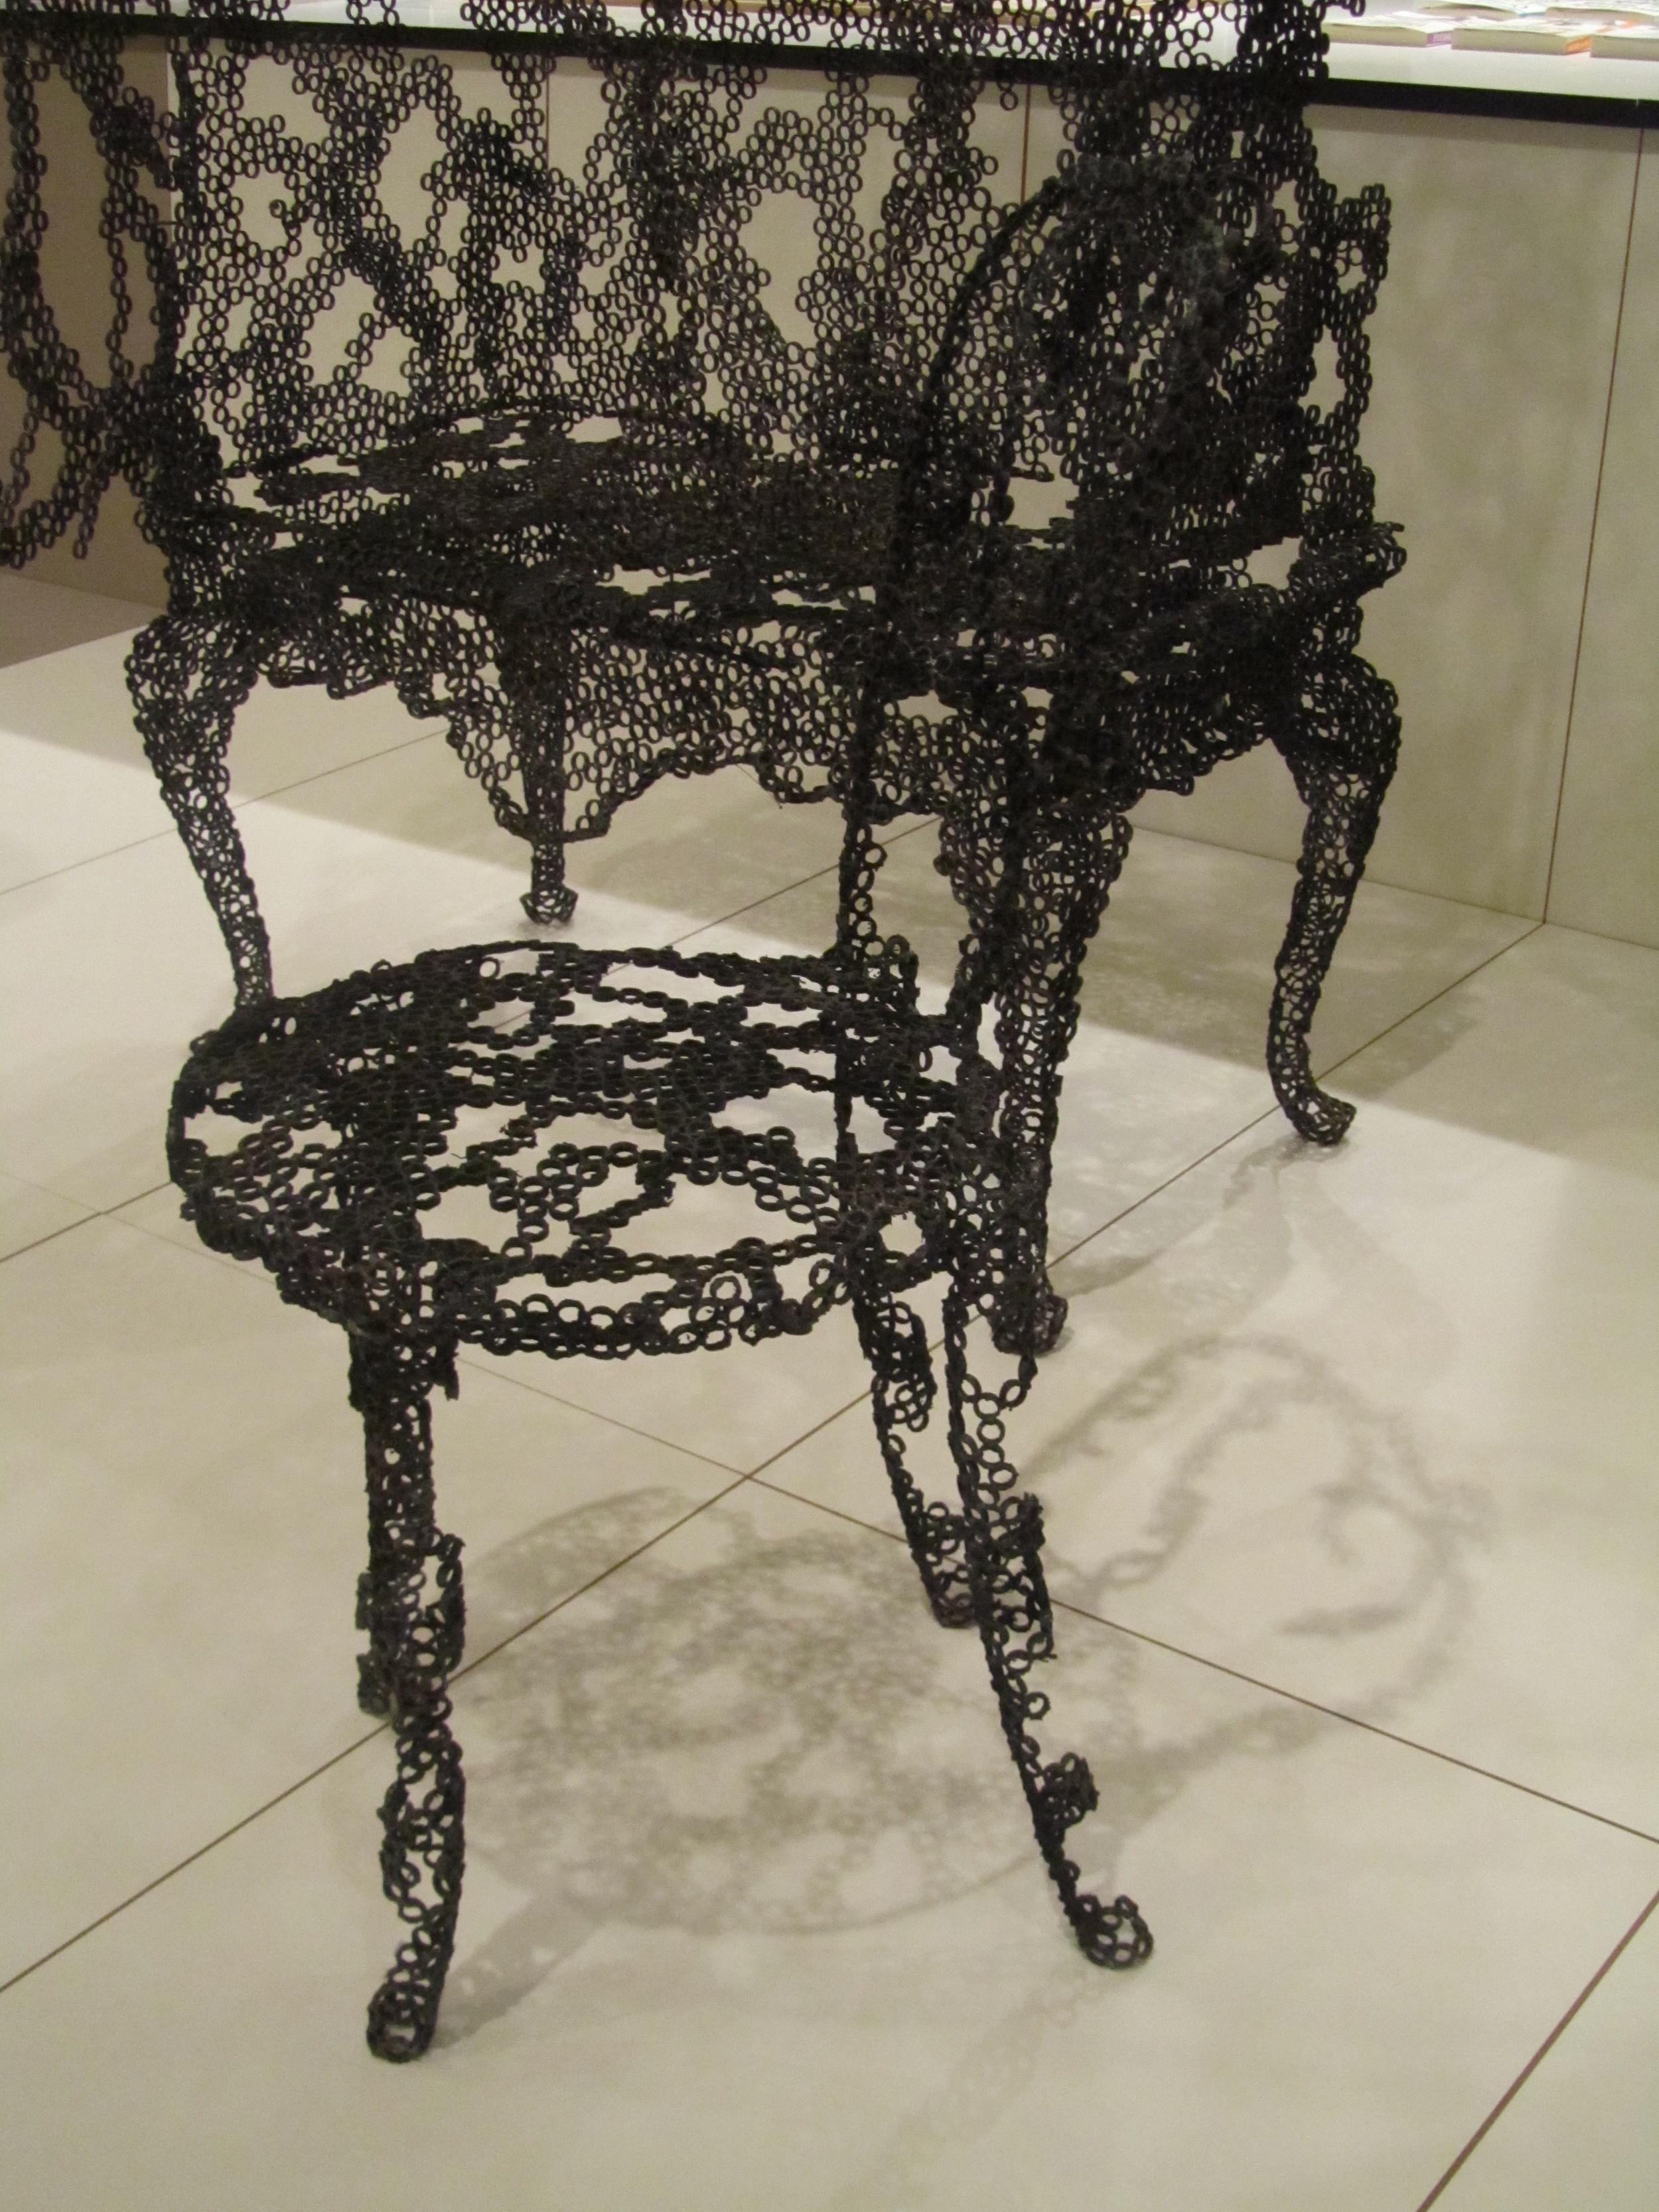 Markunpoika engineering temporarality burnt chair.JPG